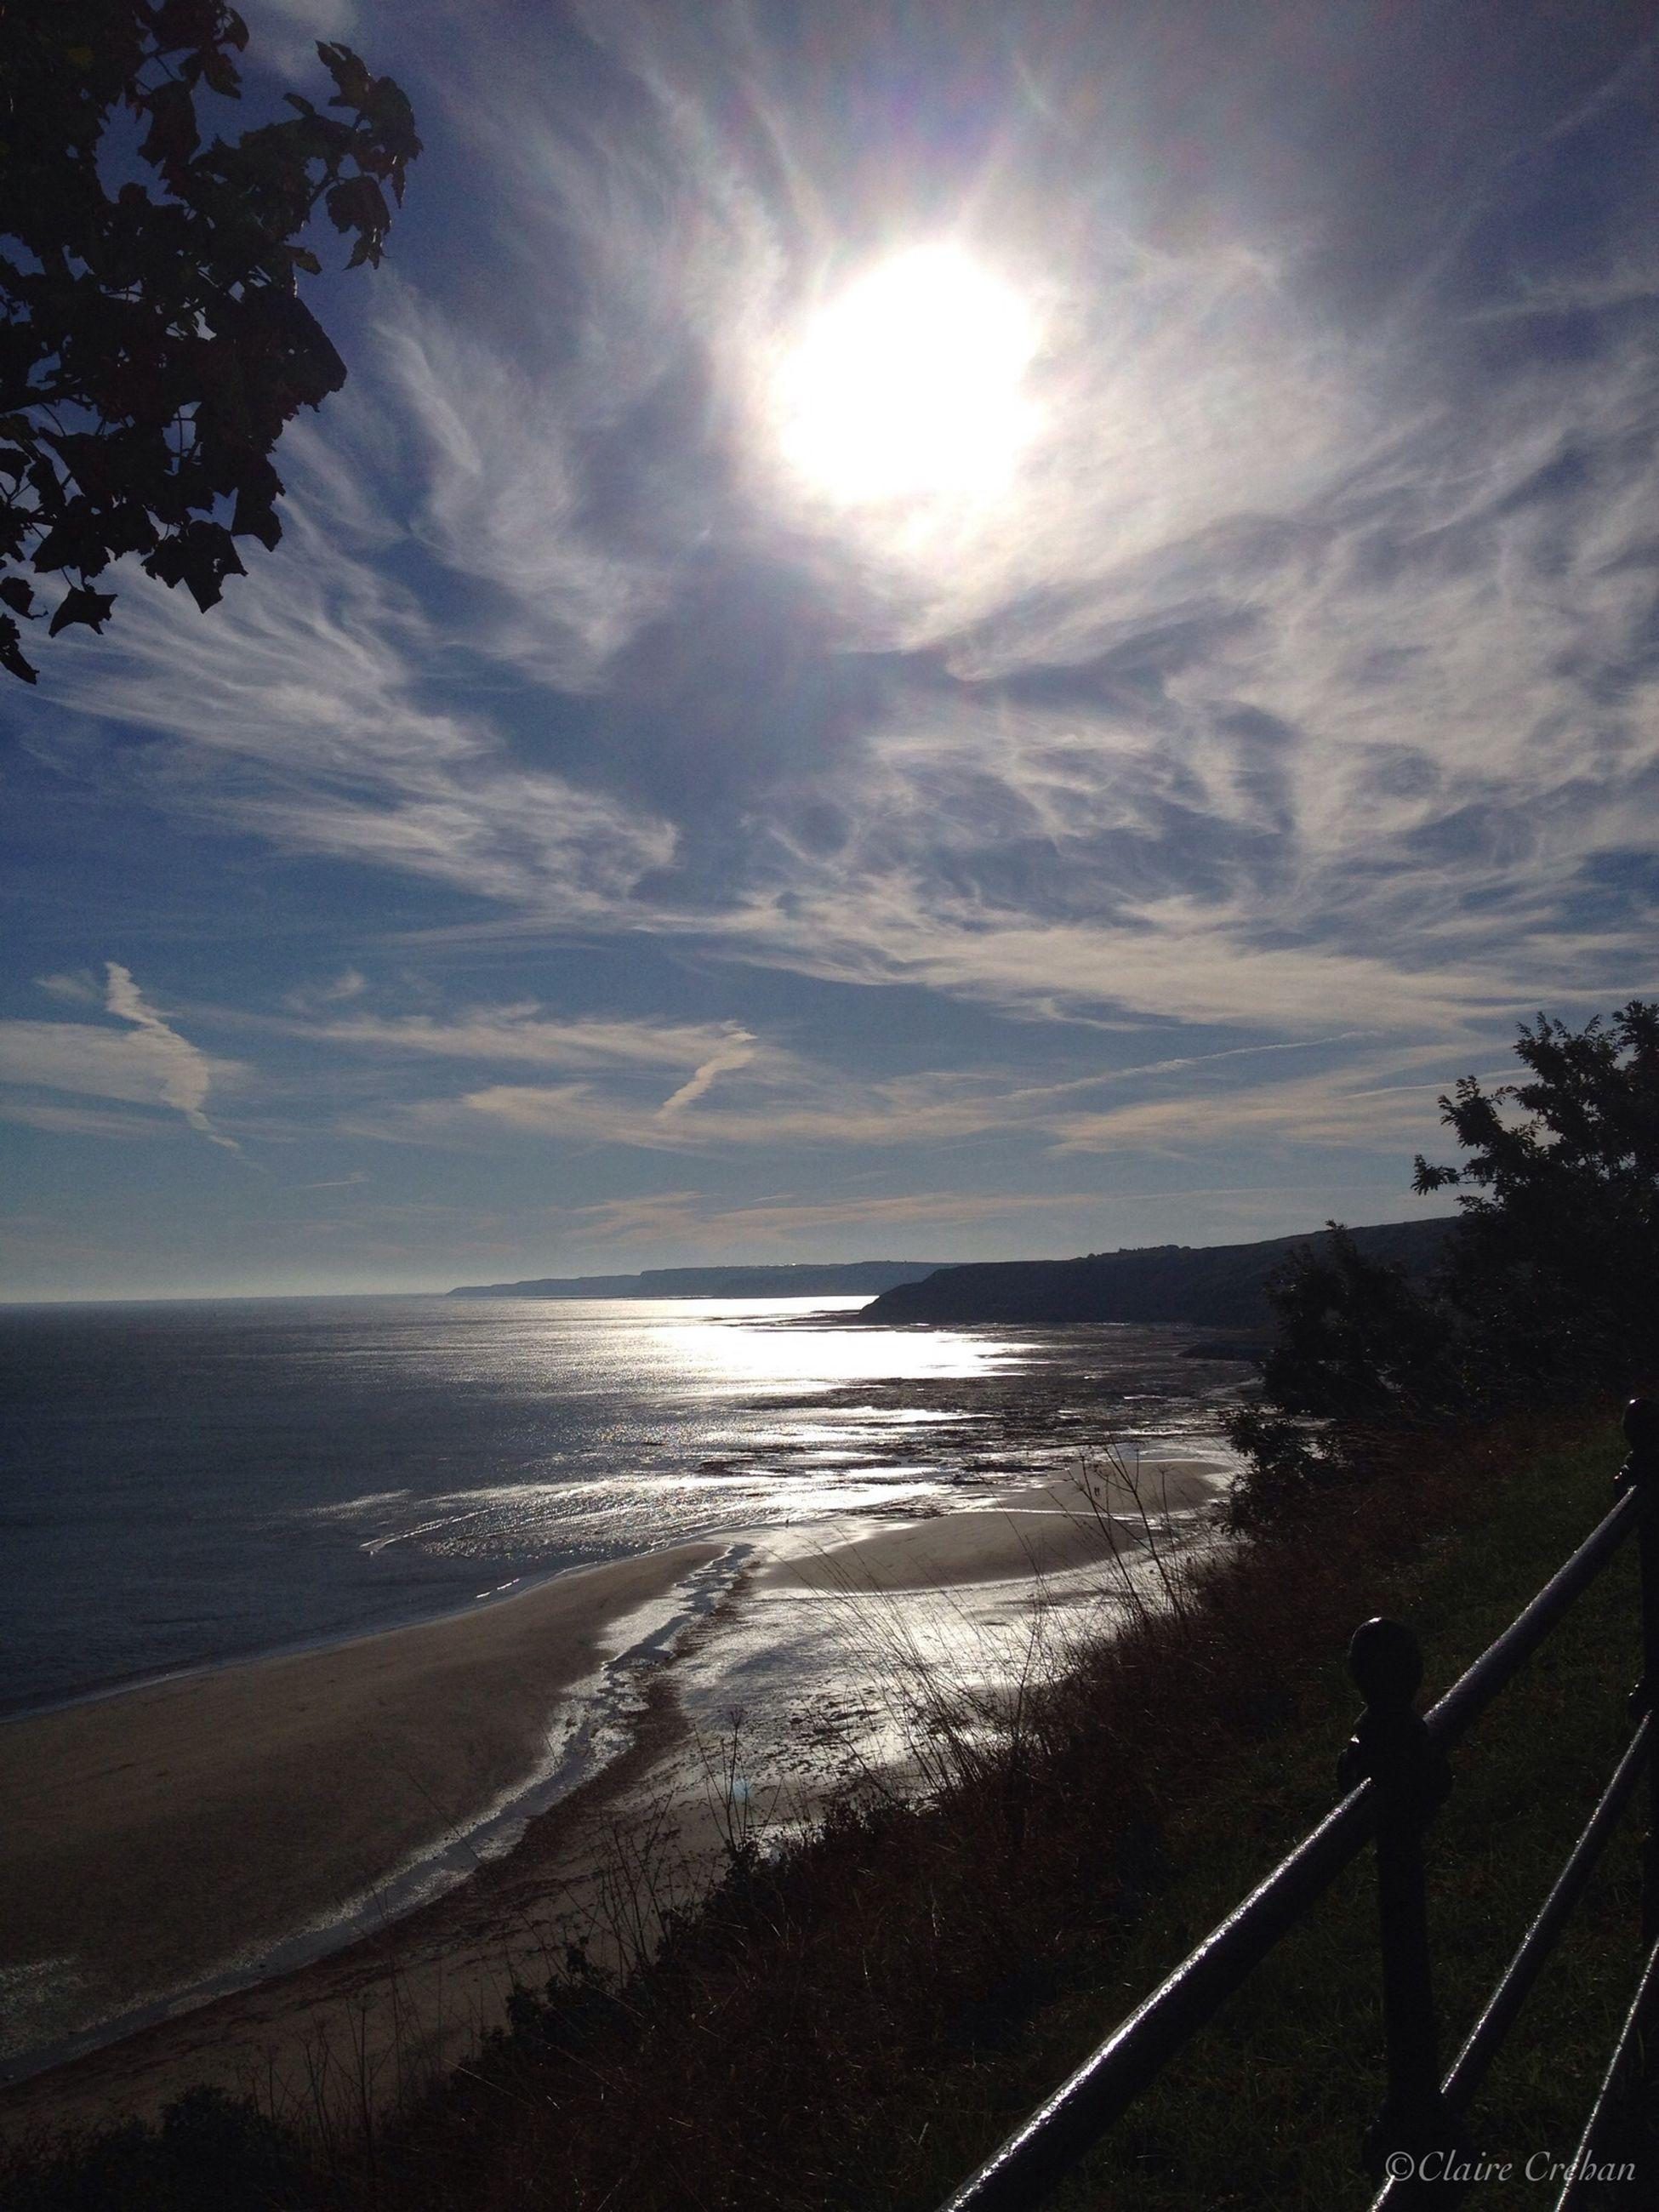 water, sea, tranquil scene, tranquility, sky, scenics, horizon over water, sun, beauty in nature, beach, sunlight, nature, cloud - sky, reflection, shore, sunbeam, idyllic, sunset, cloud, outdoors